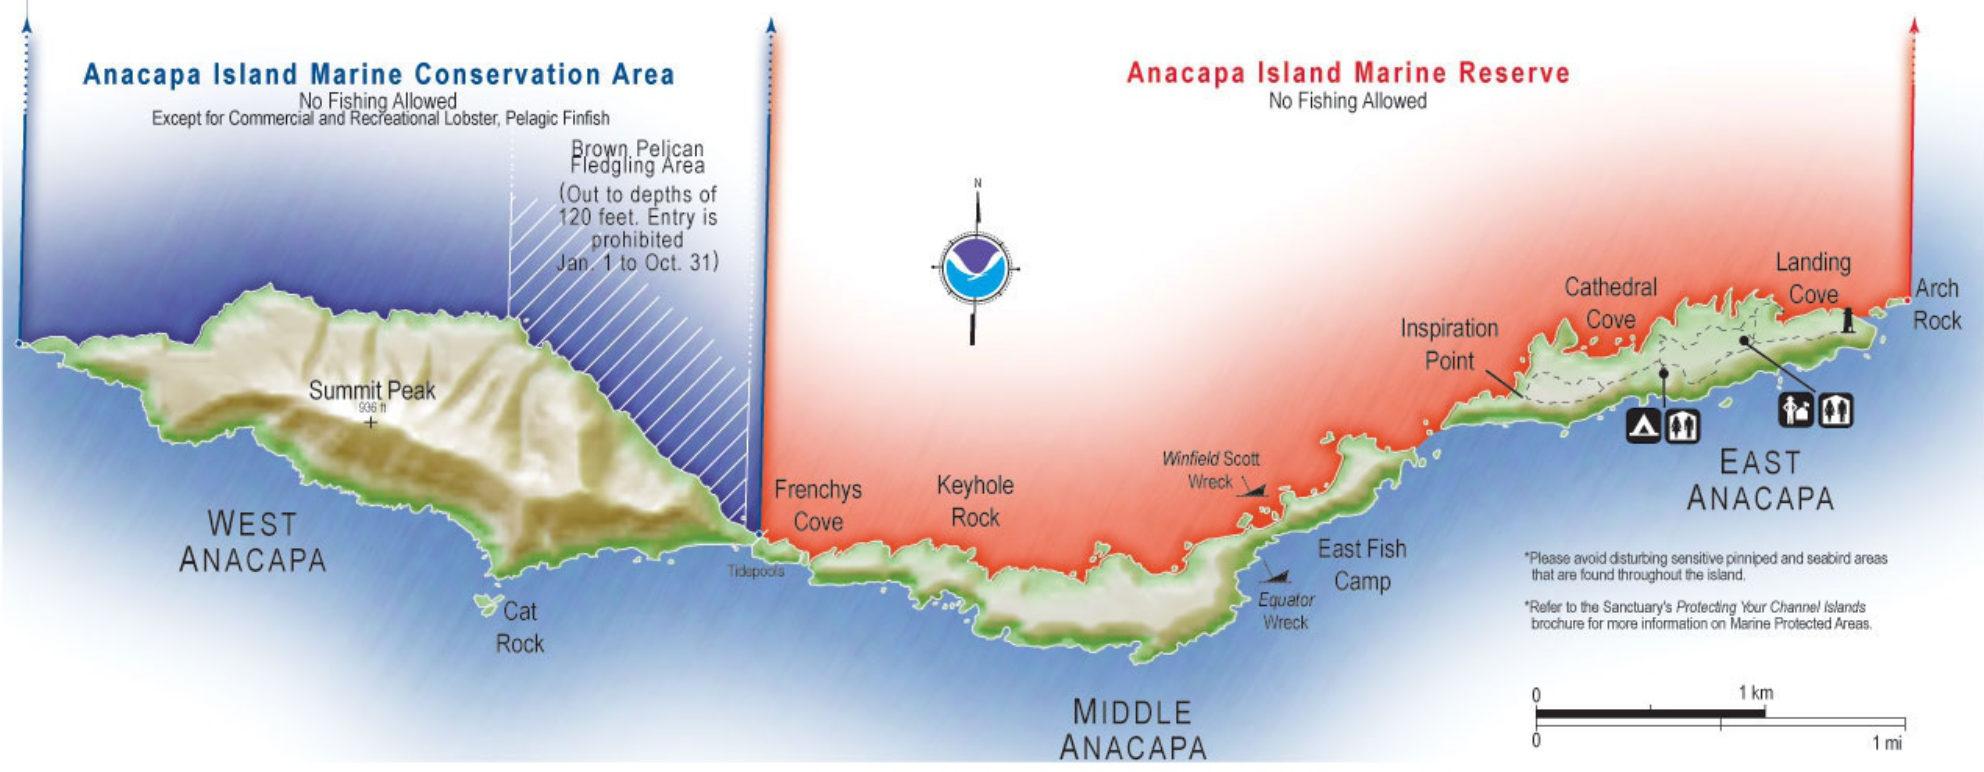 anacapa-island-map.jpg